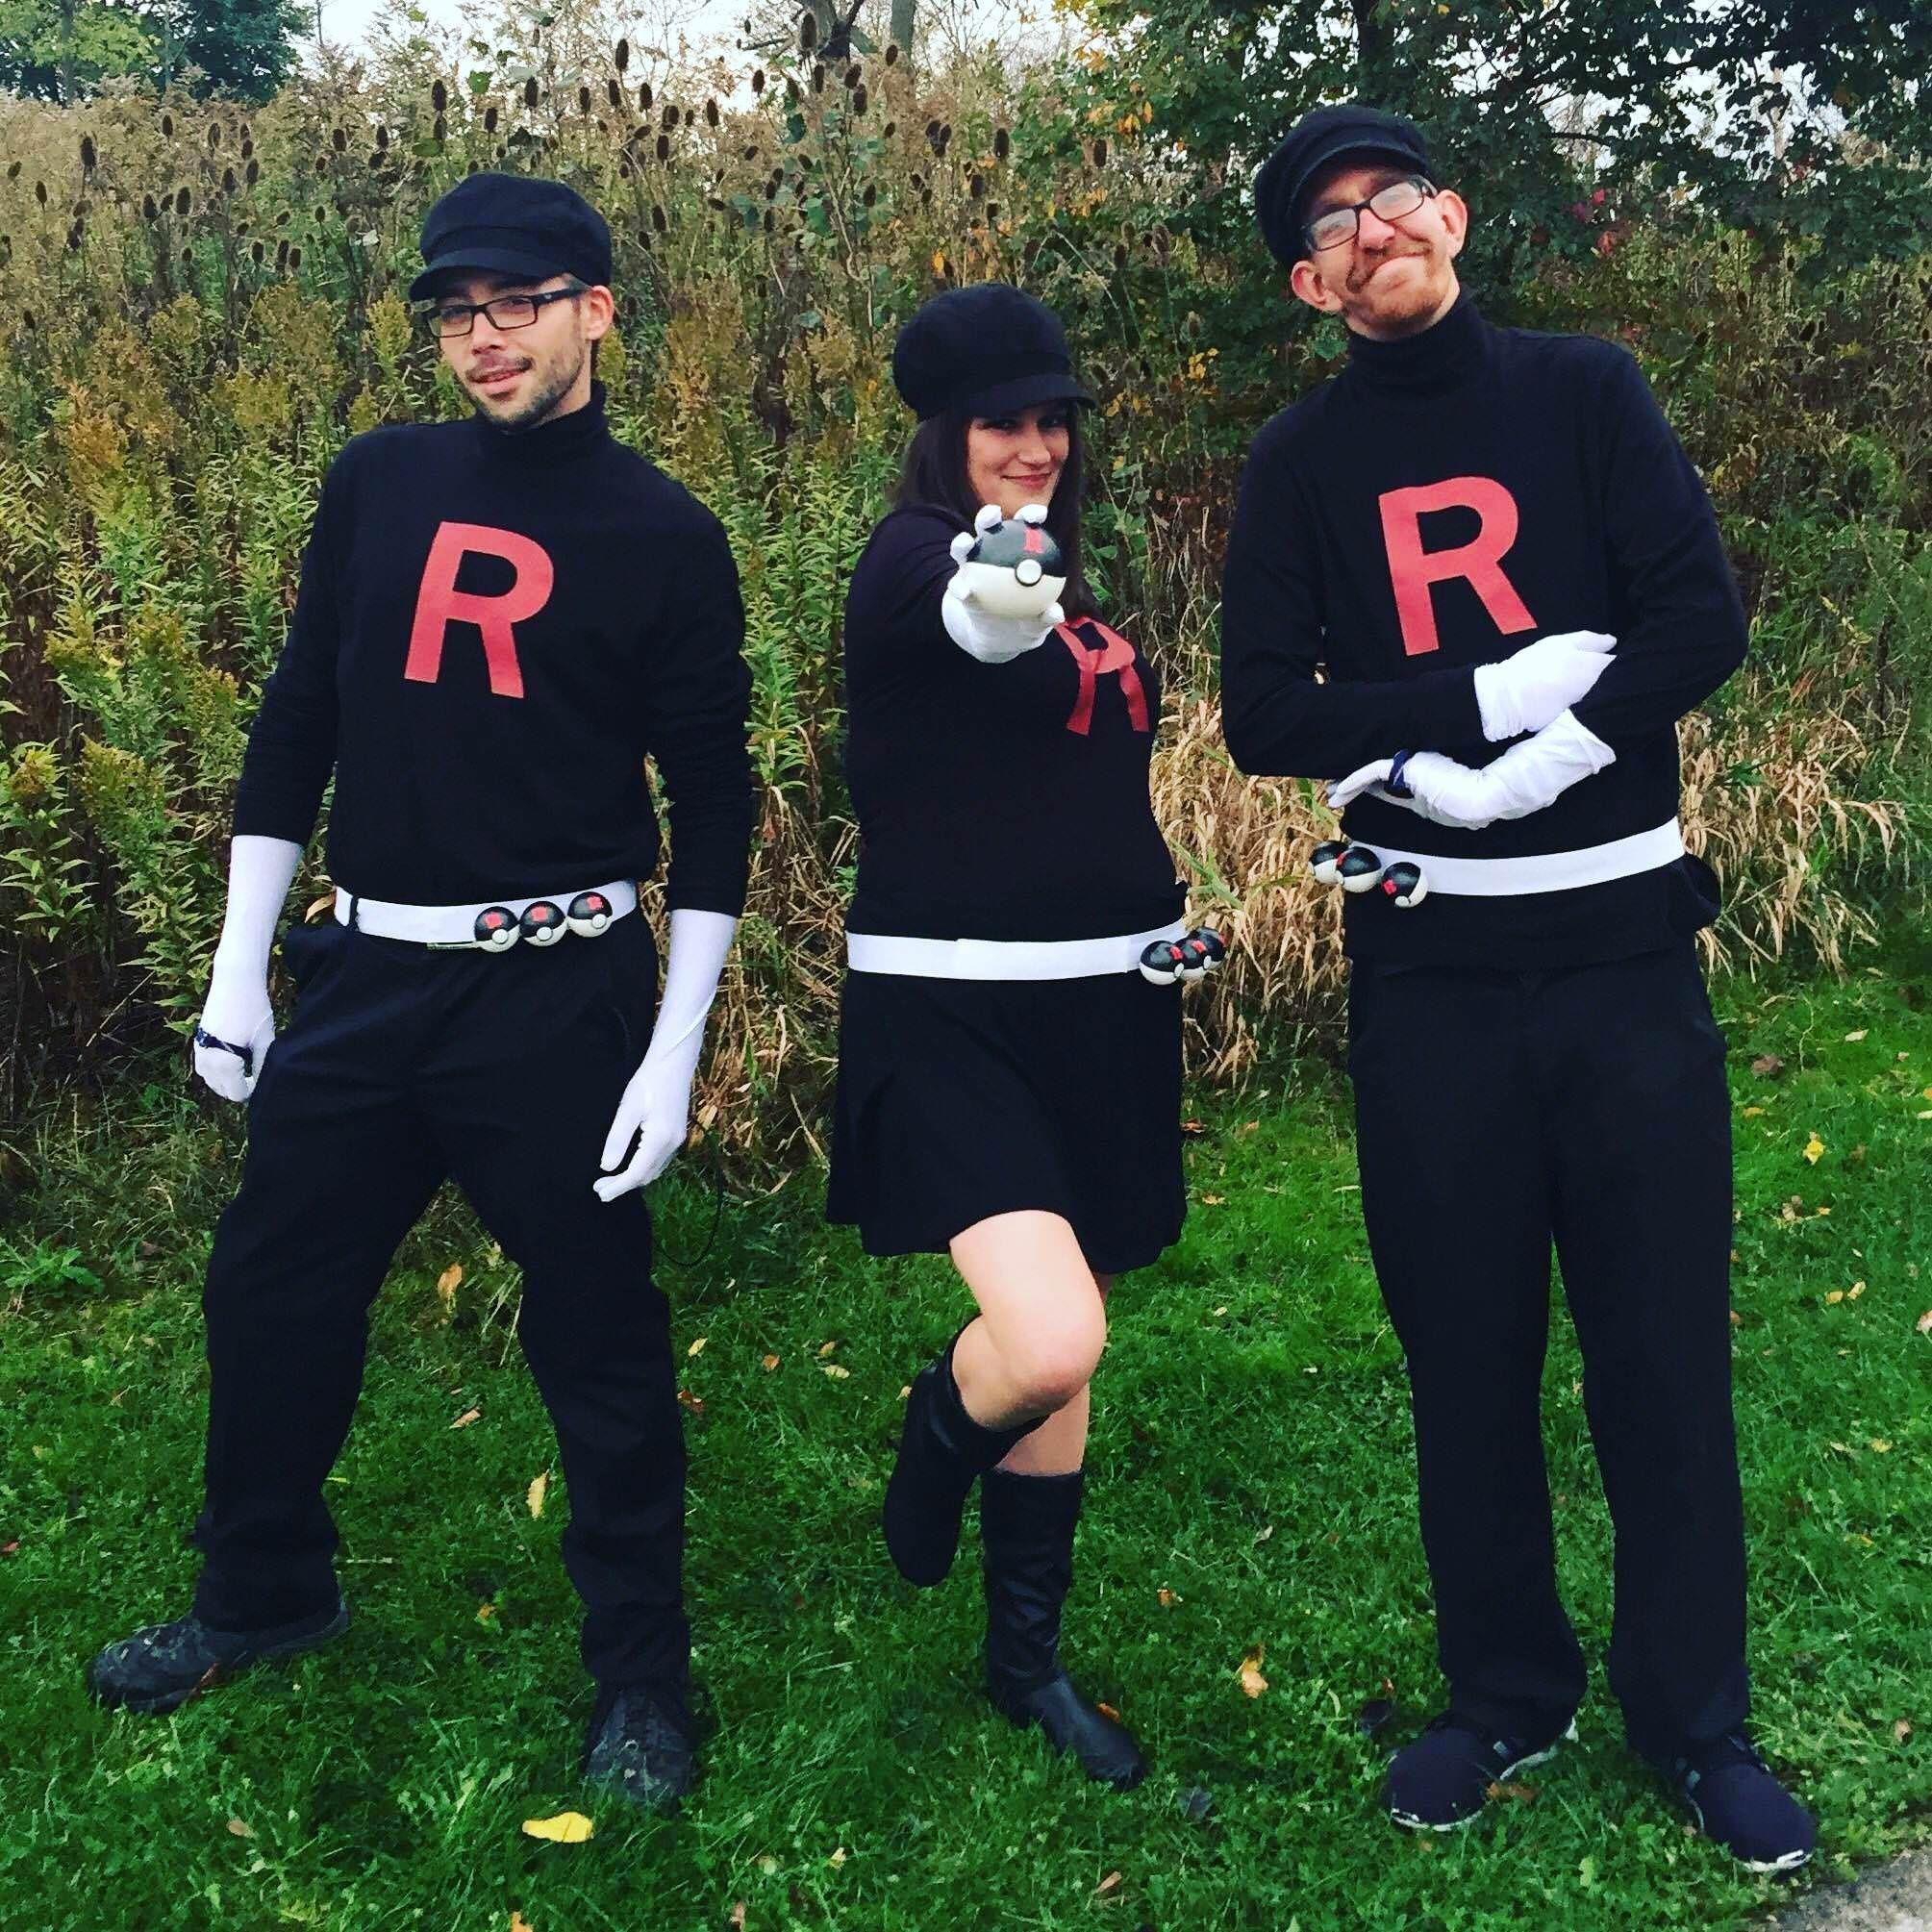 Pin by Phoebe Nguyen on Halloween Team rocket grunt